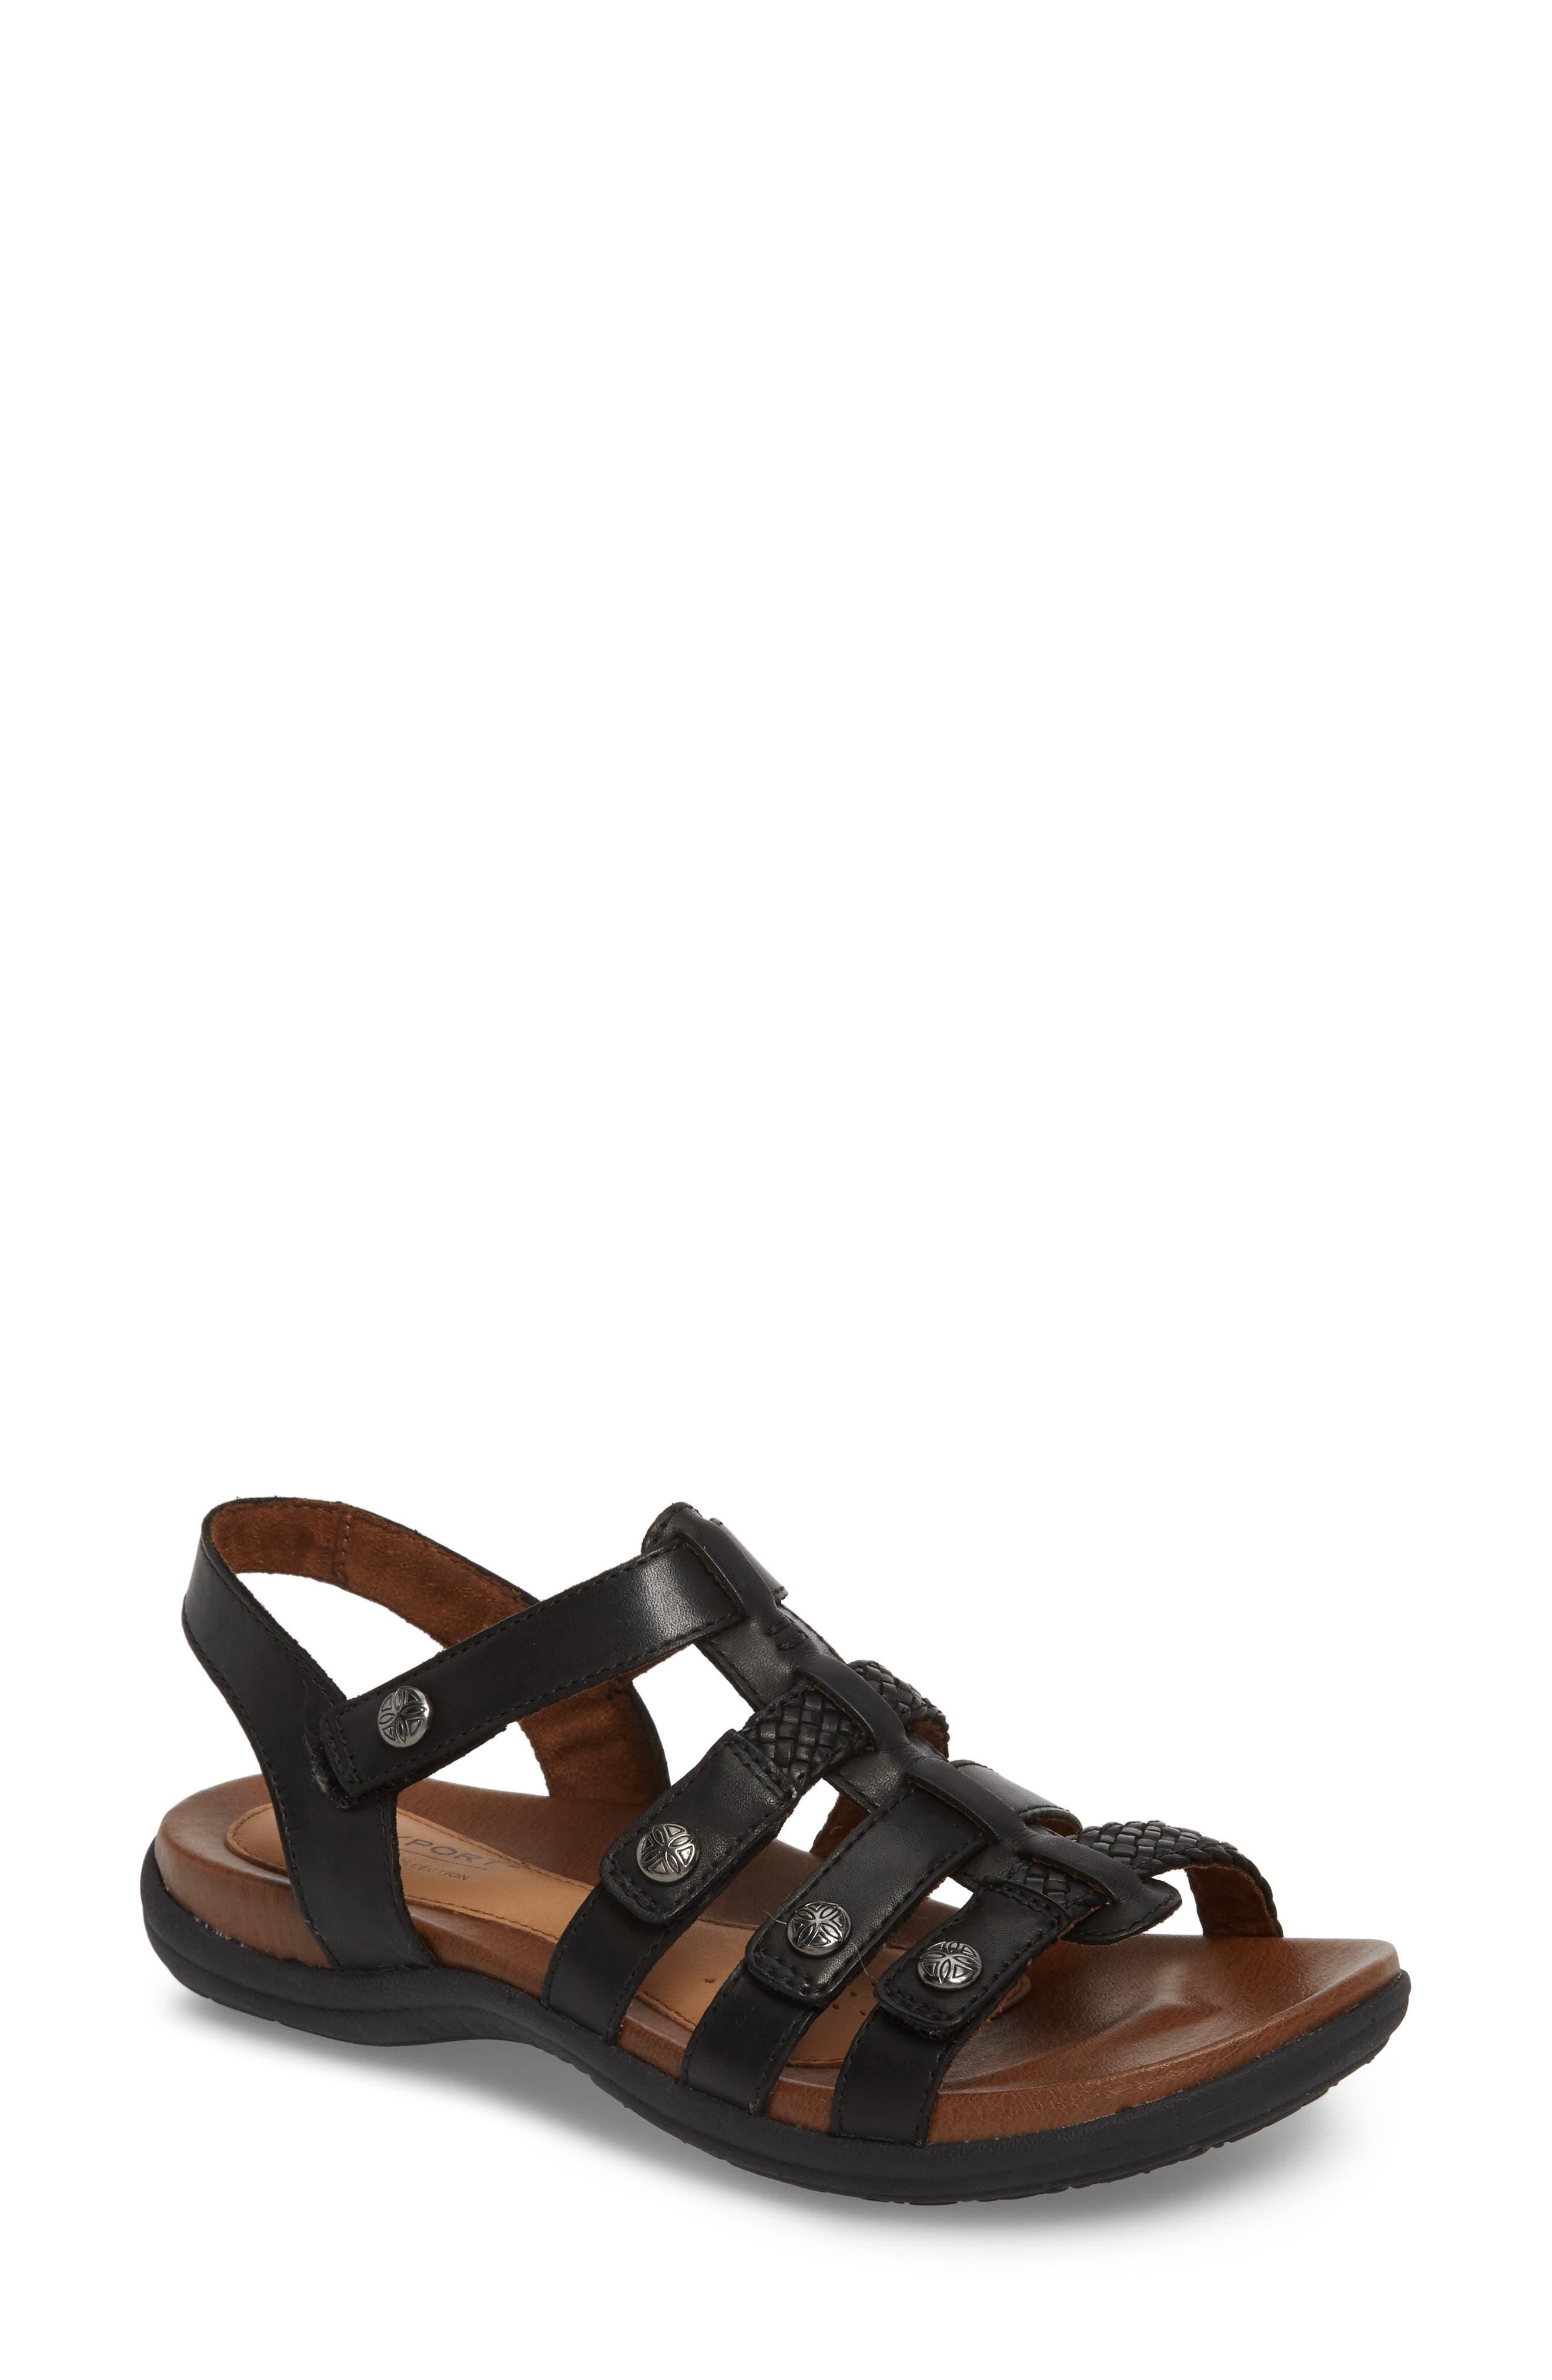 Rubey T-Strap Sandal,                         Main,                         color, BLACK LEATHER